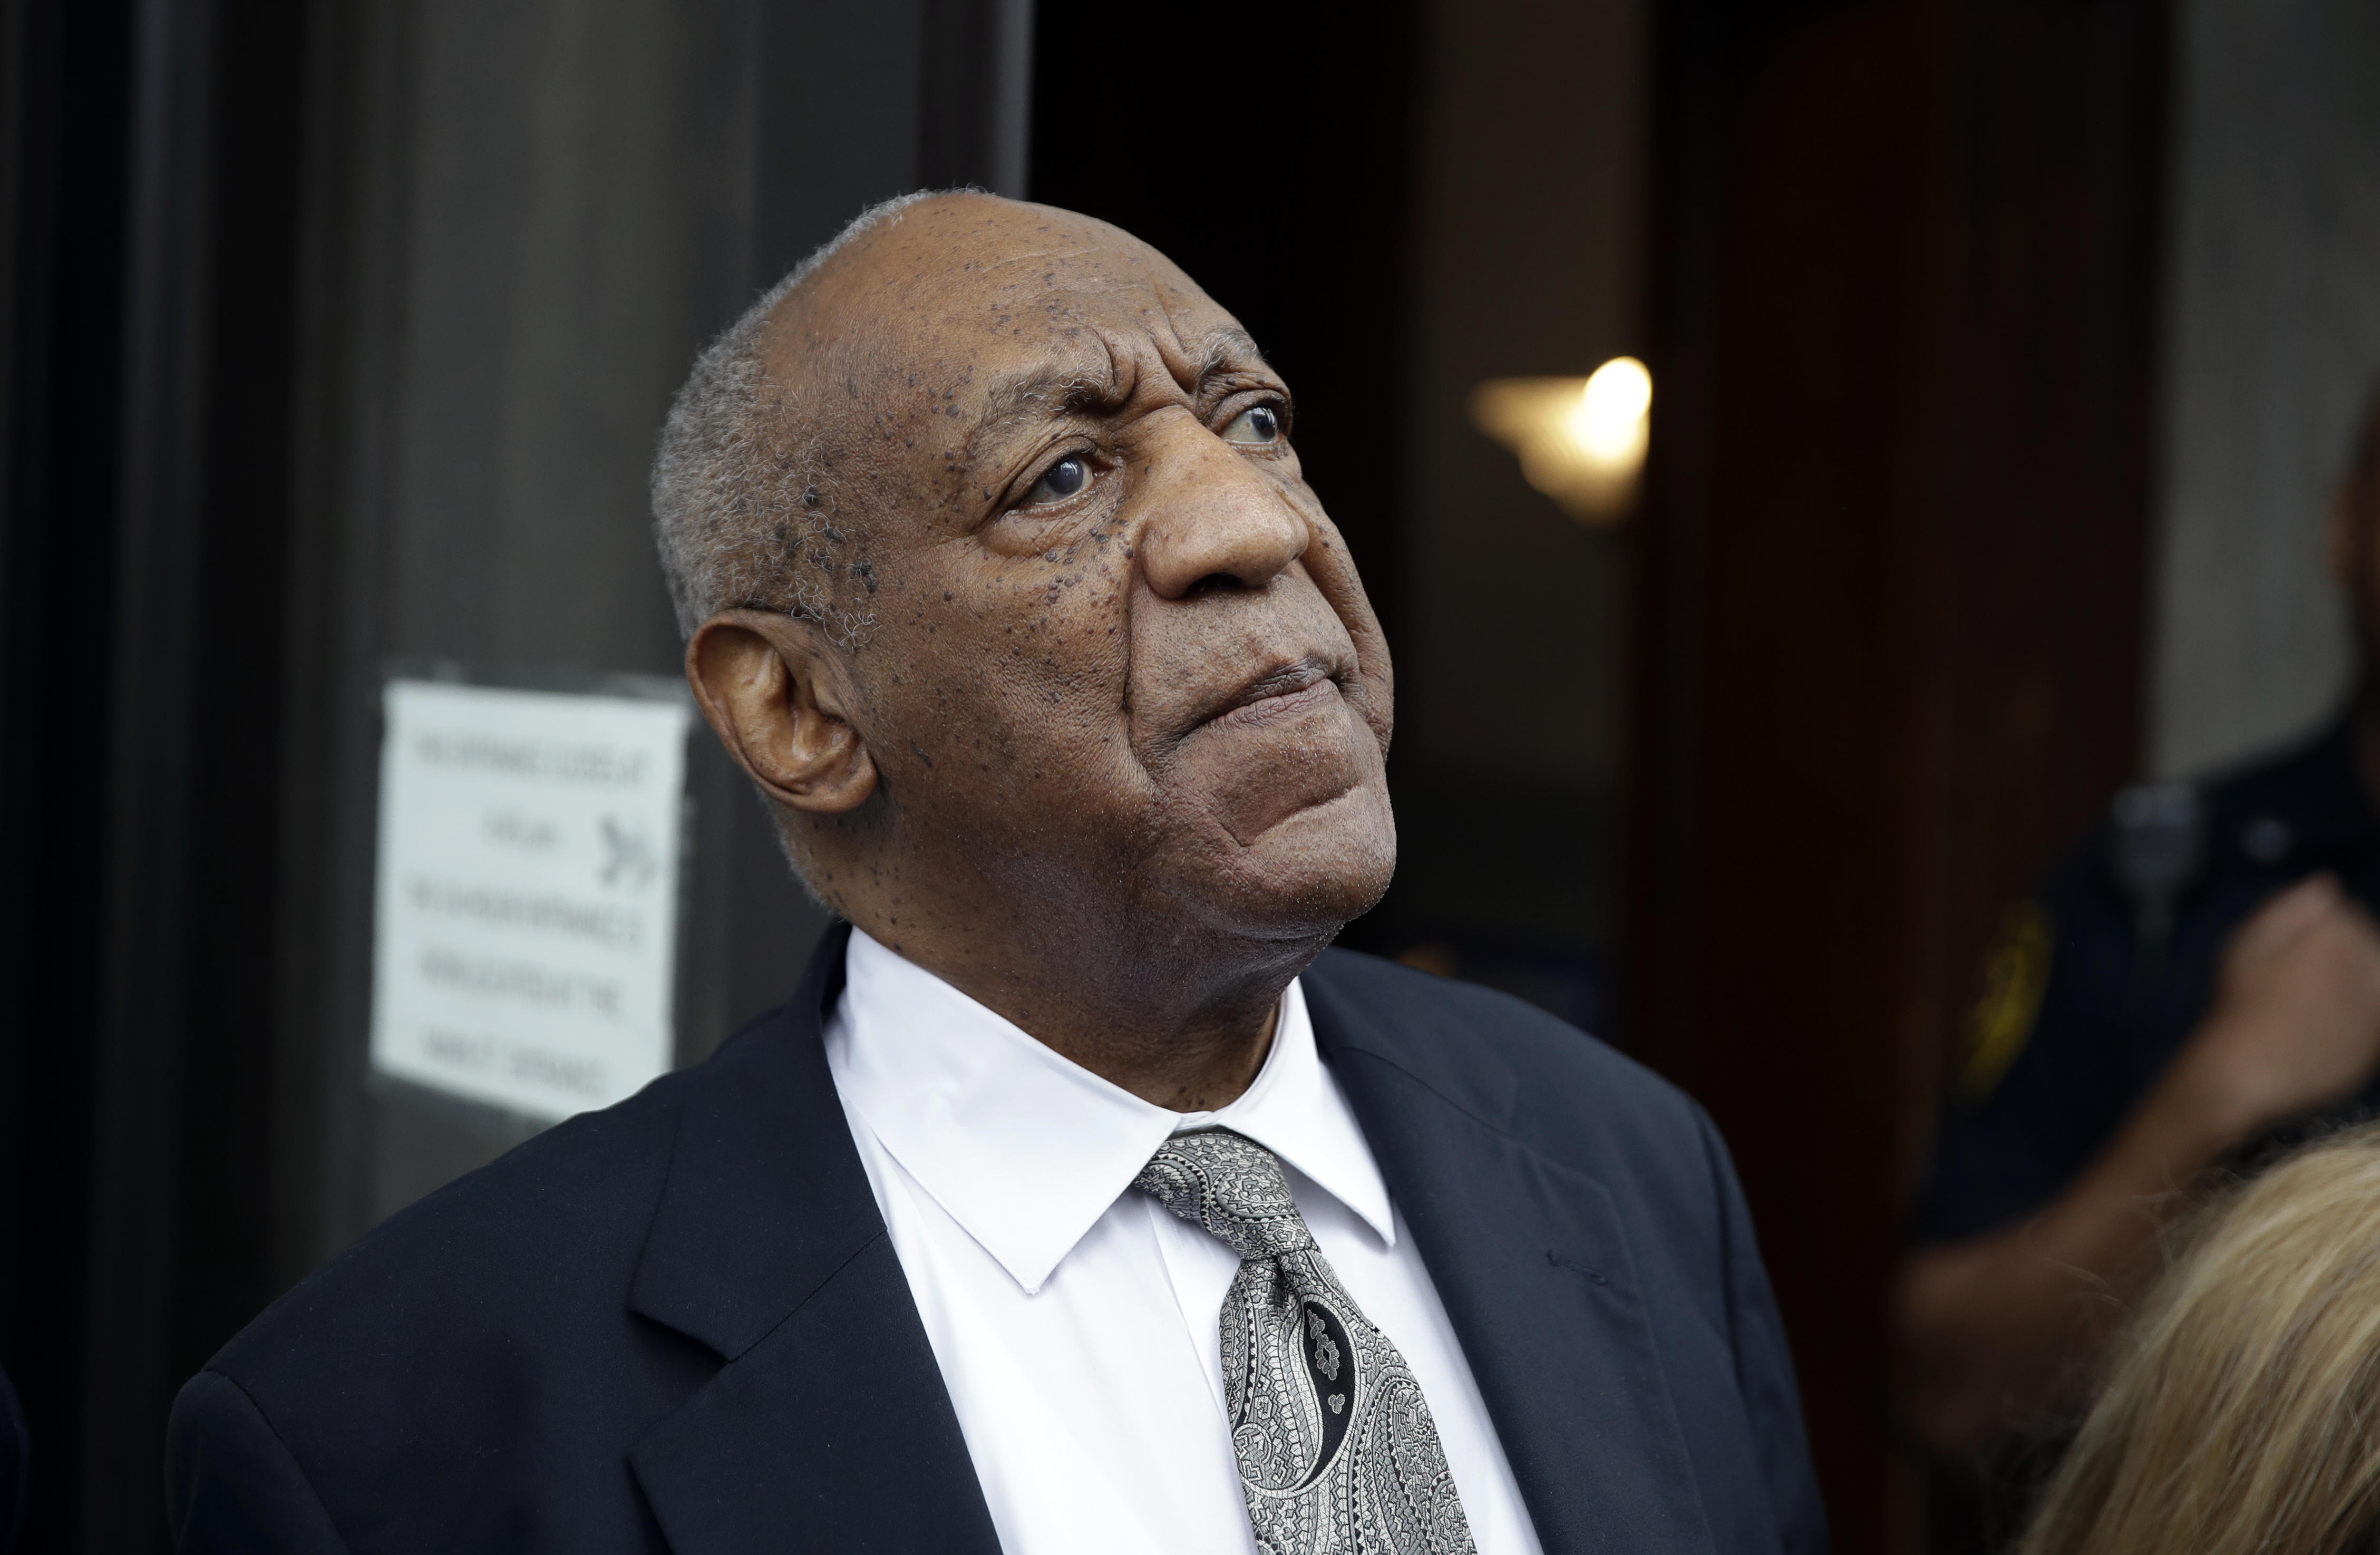 Attorney Bill Cosby